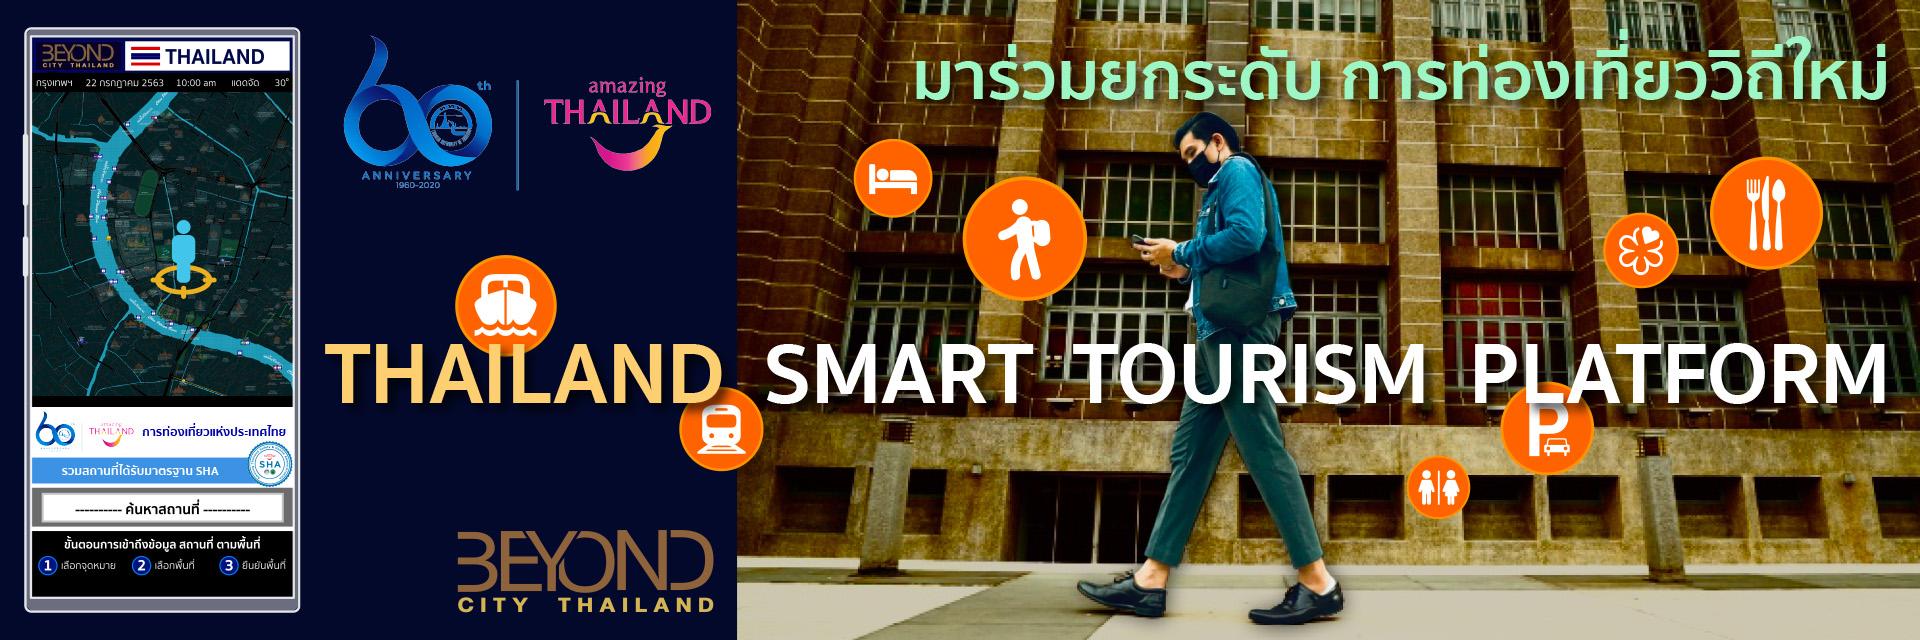 Thailand Smart Tourism Platform